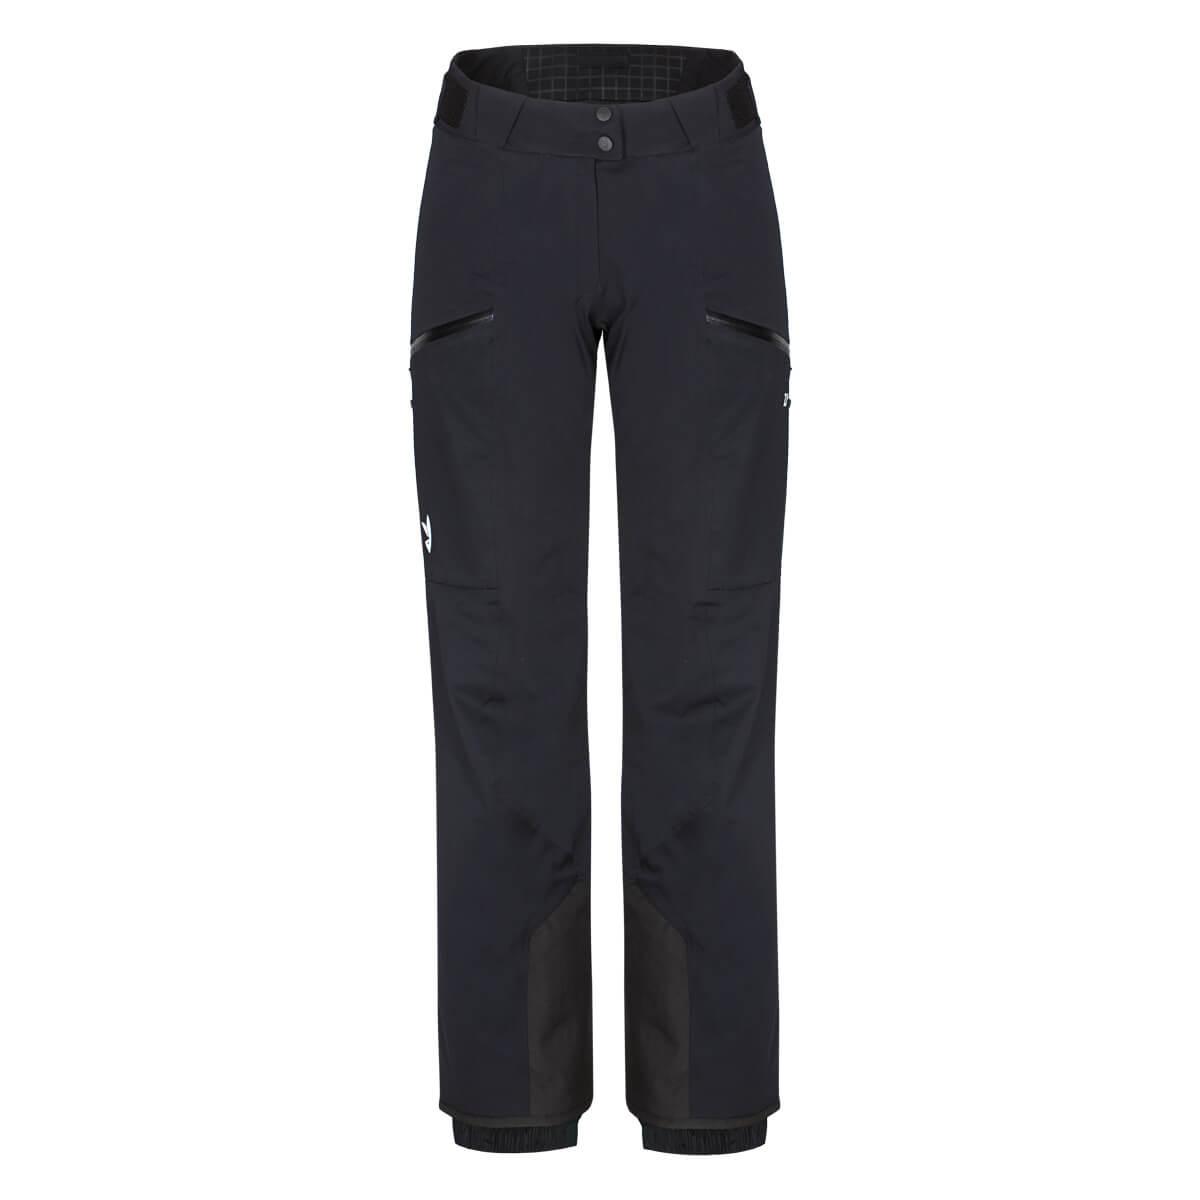 Dámske lyžiarske nohavice Zajo Civetta W Pants Black - veľkosť XS